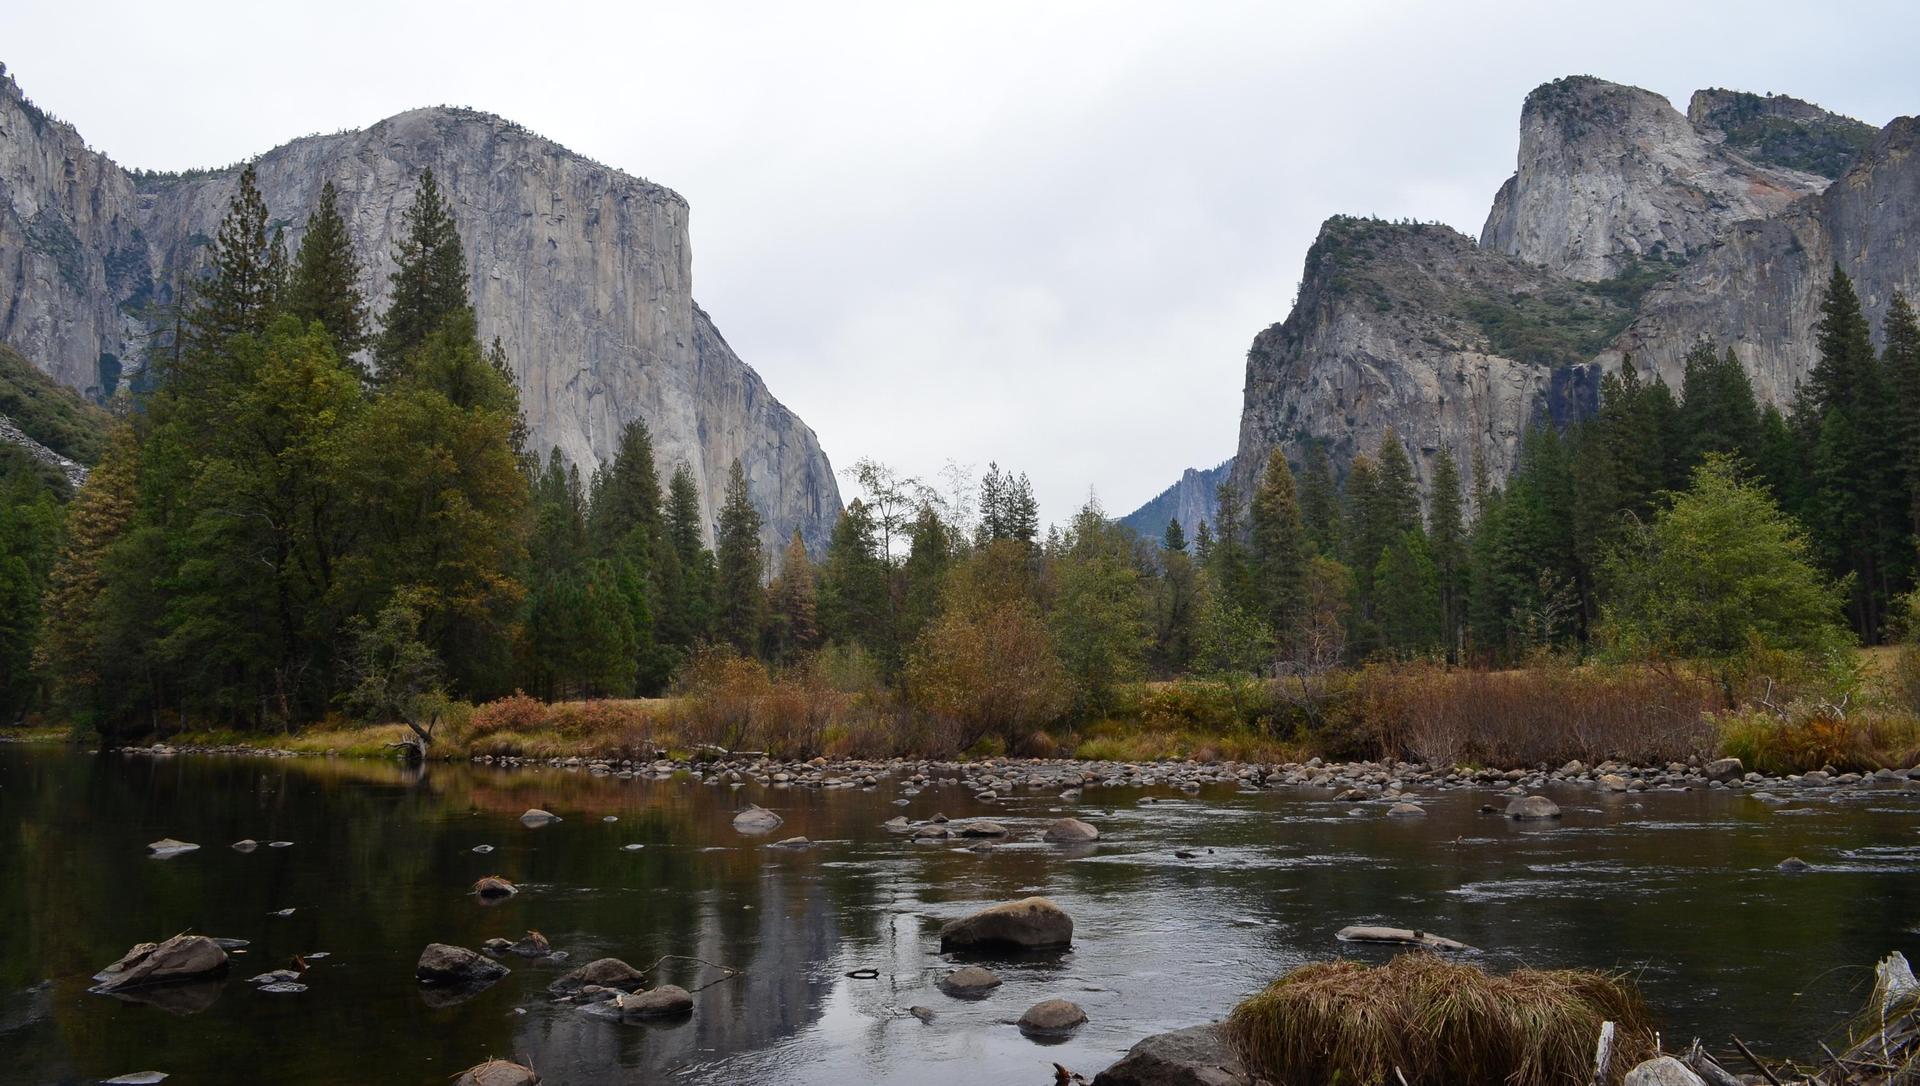 Valley View at Yosemite National Park